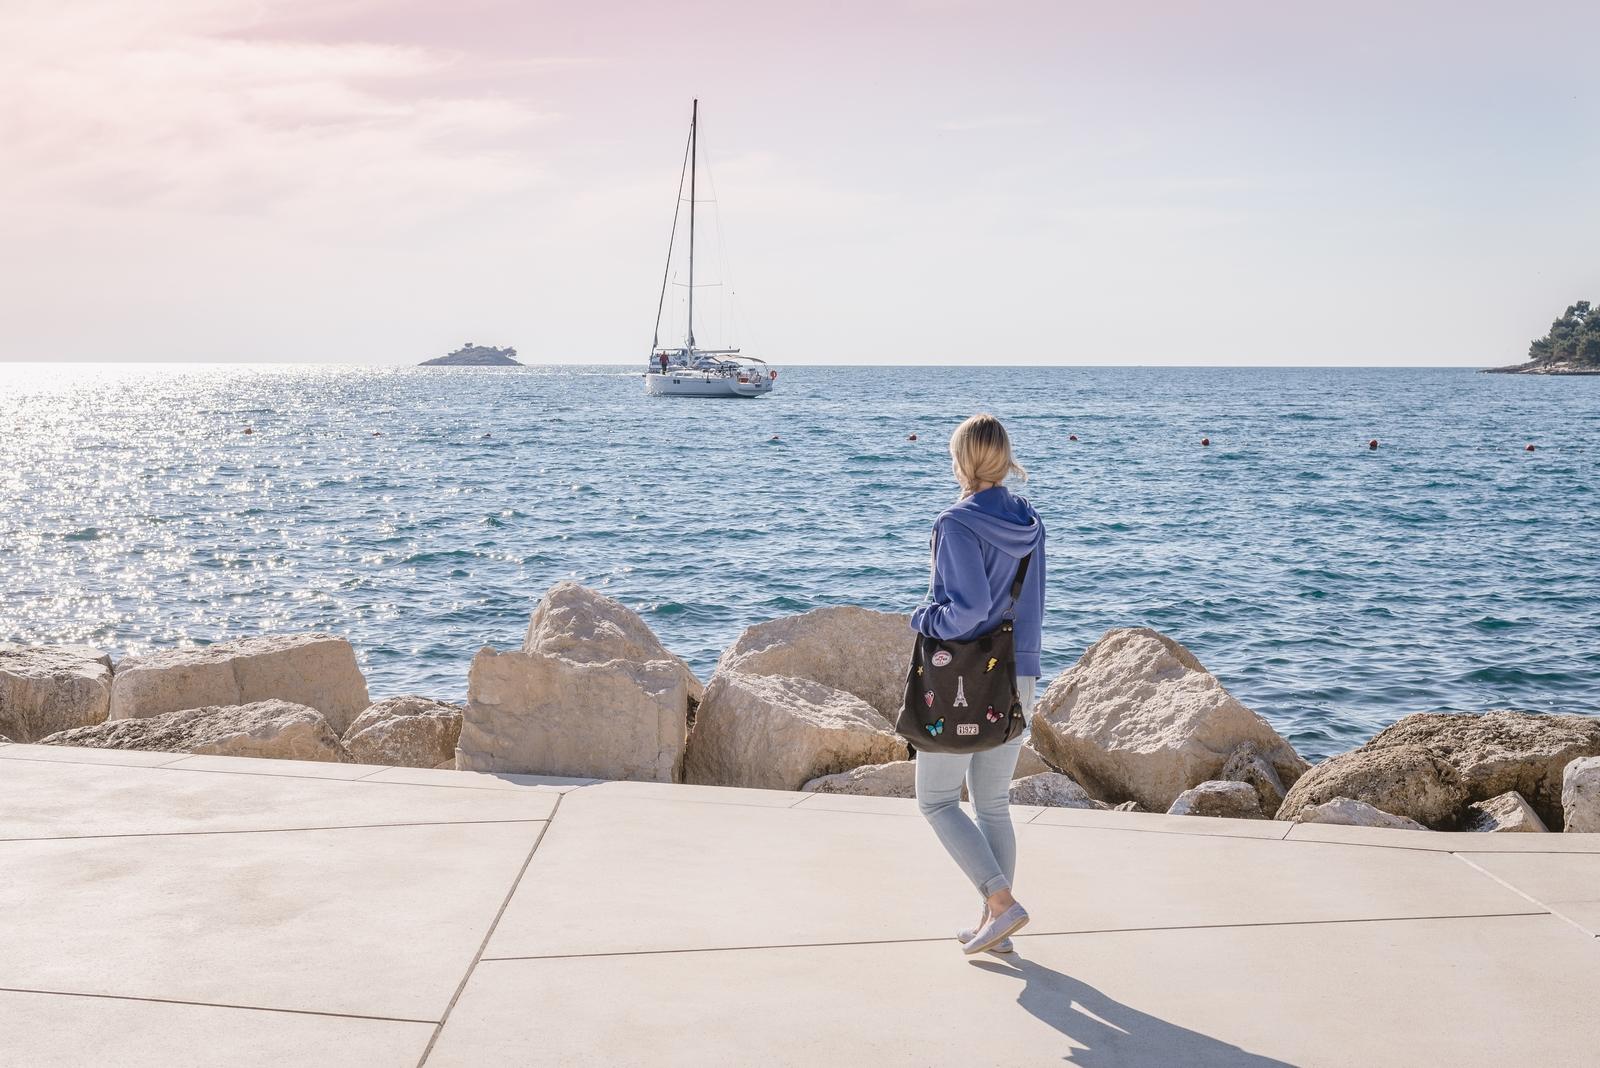 Seaside promenade in Rovinj on the Istrian peninsula, Croatia - from travel blog http://Epepa.eu